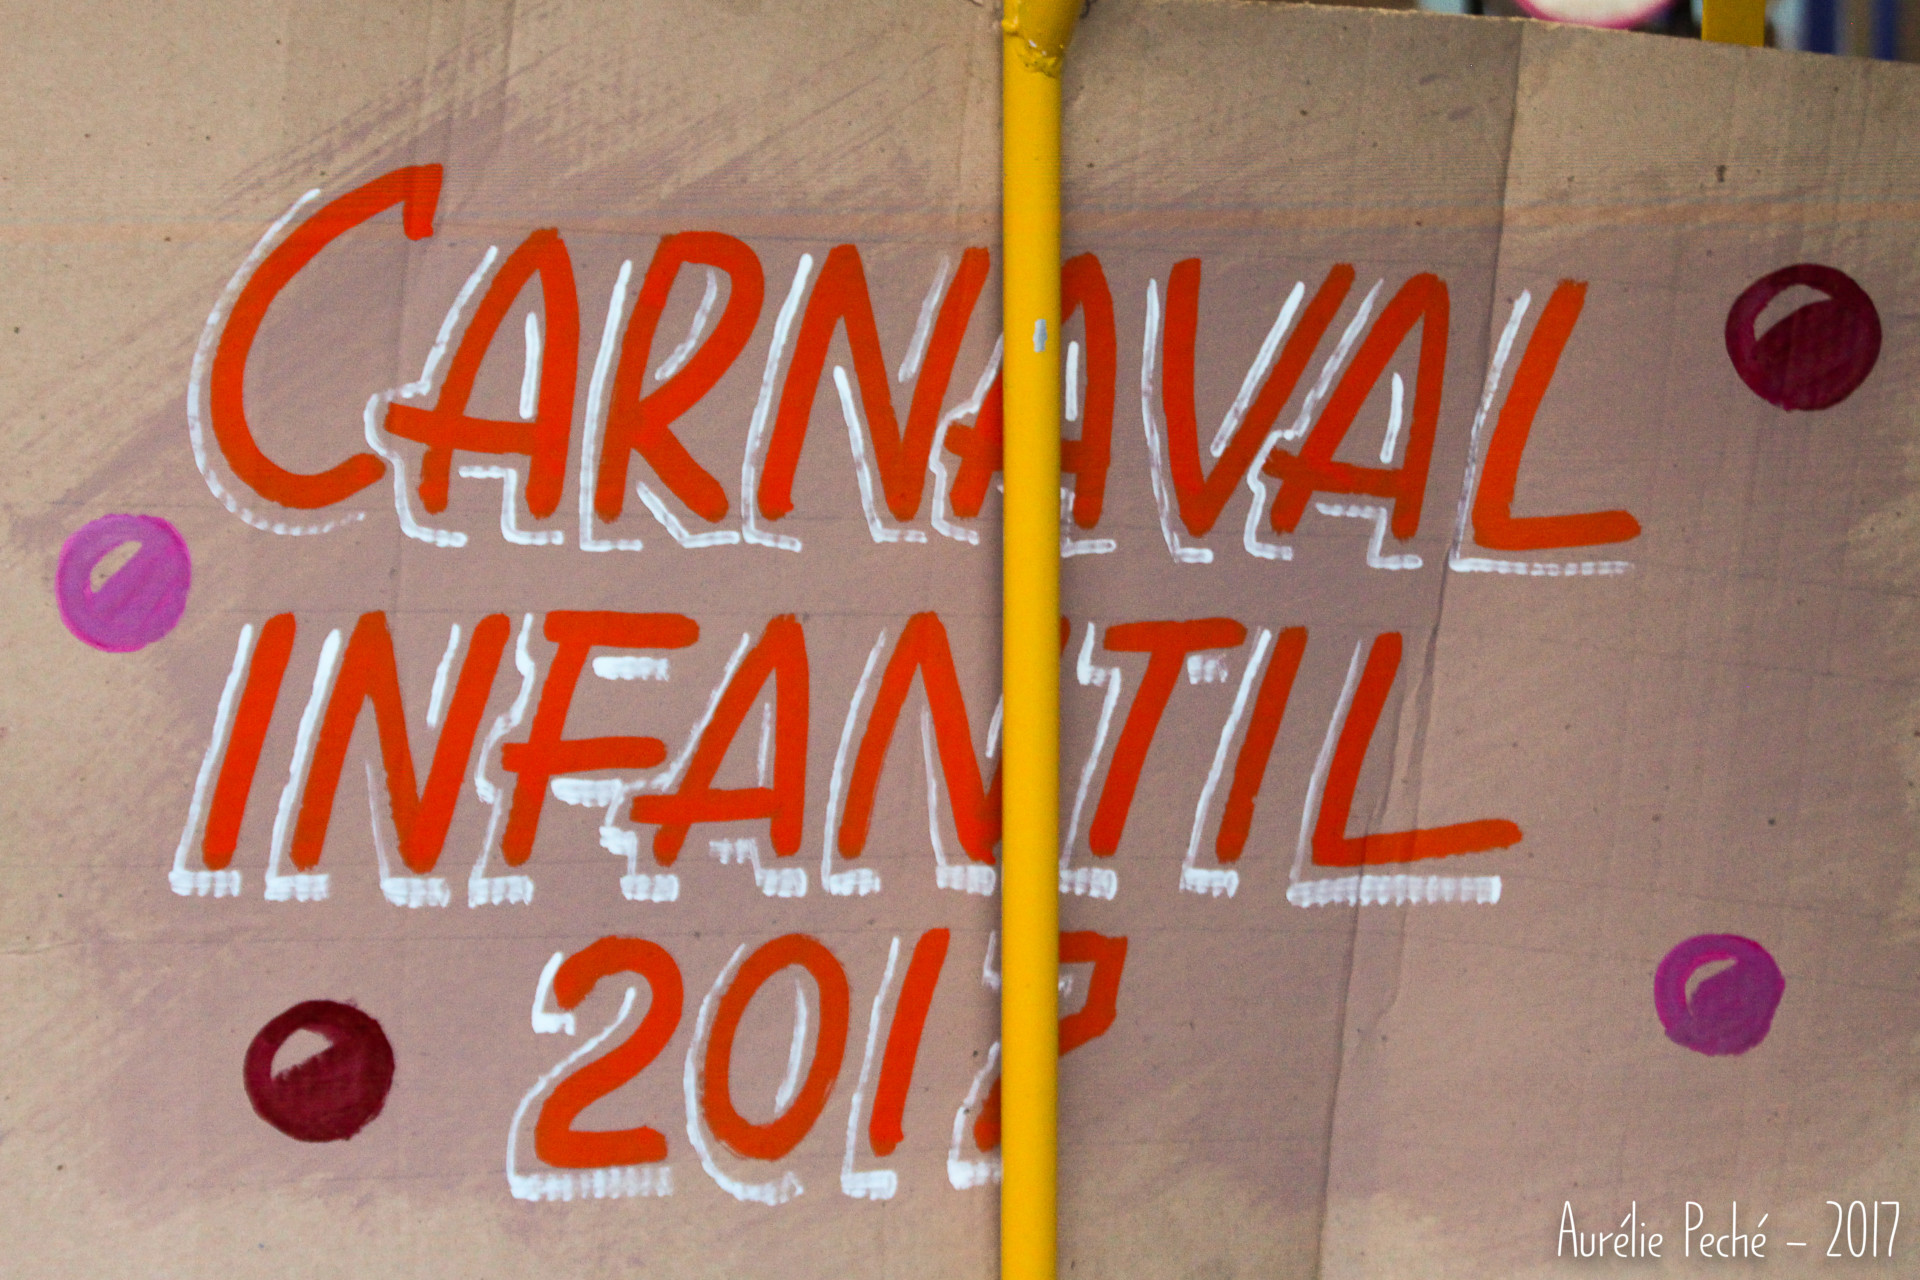 Carnaval infantile de Santiago de Cuba